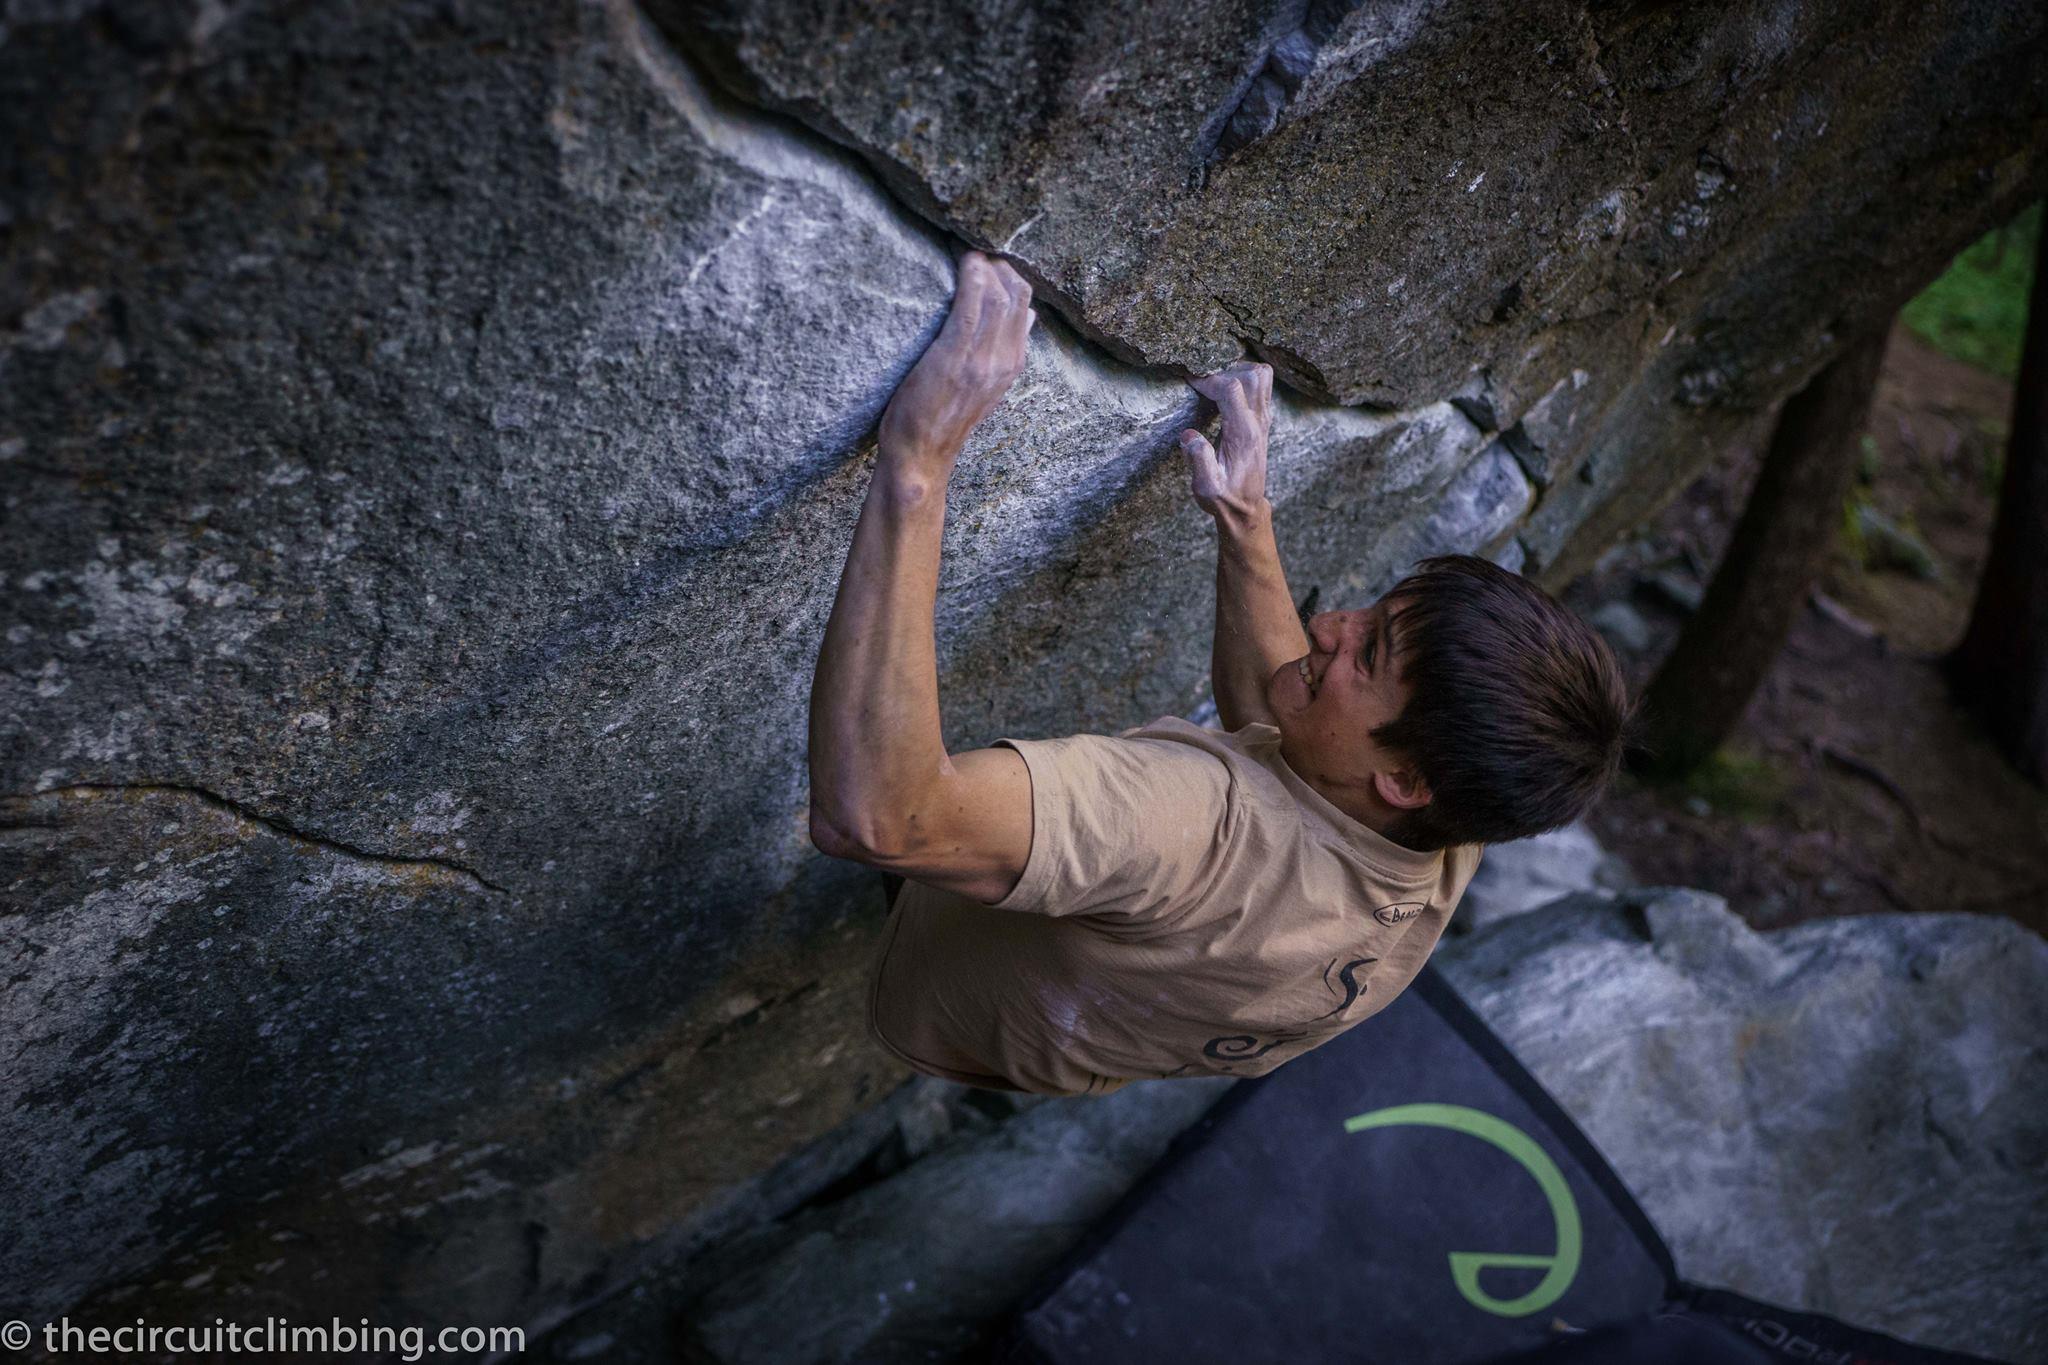 (c) Eddie Fowke (The Circuit Climbing)